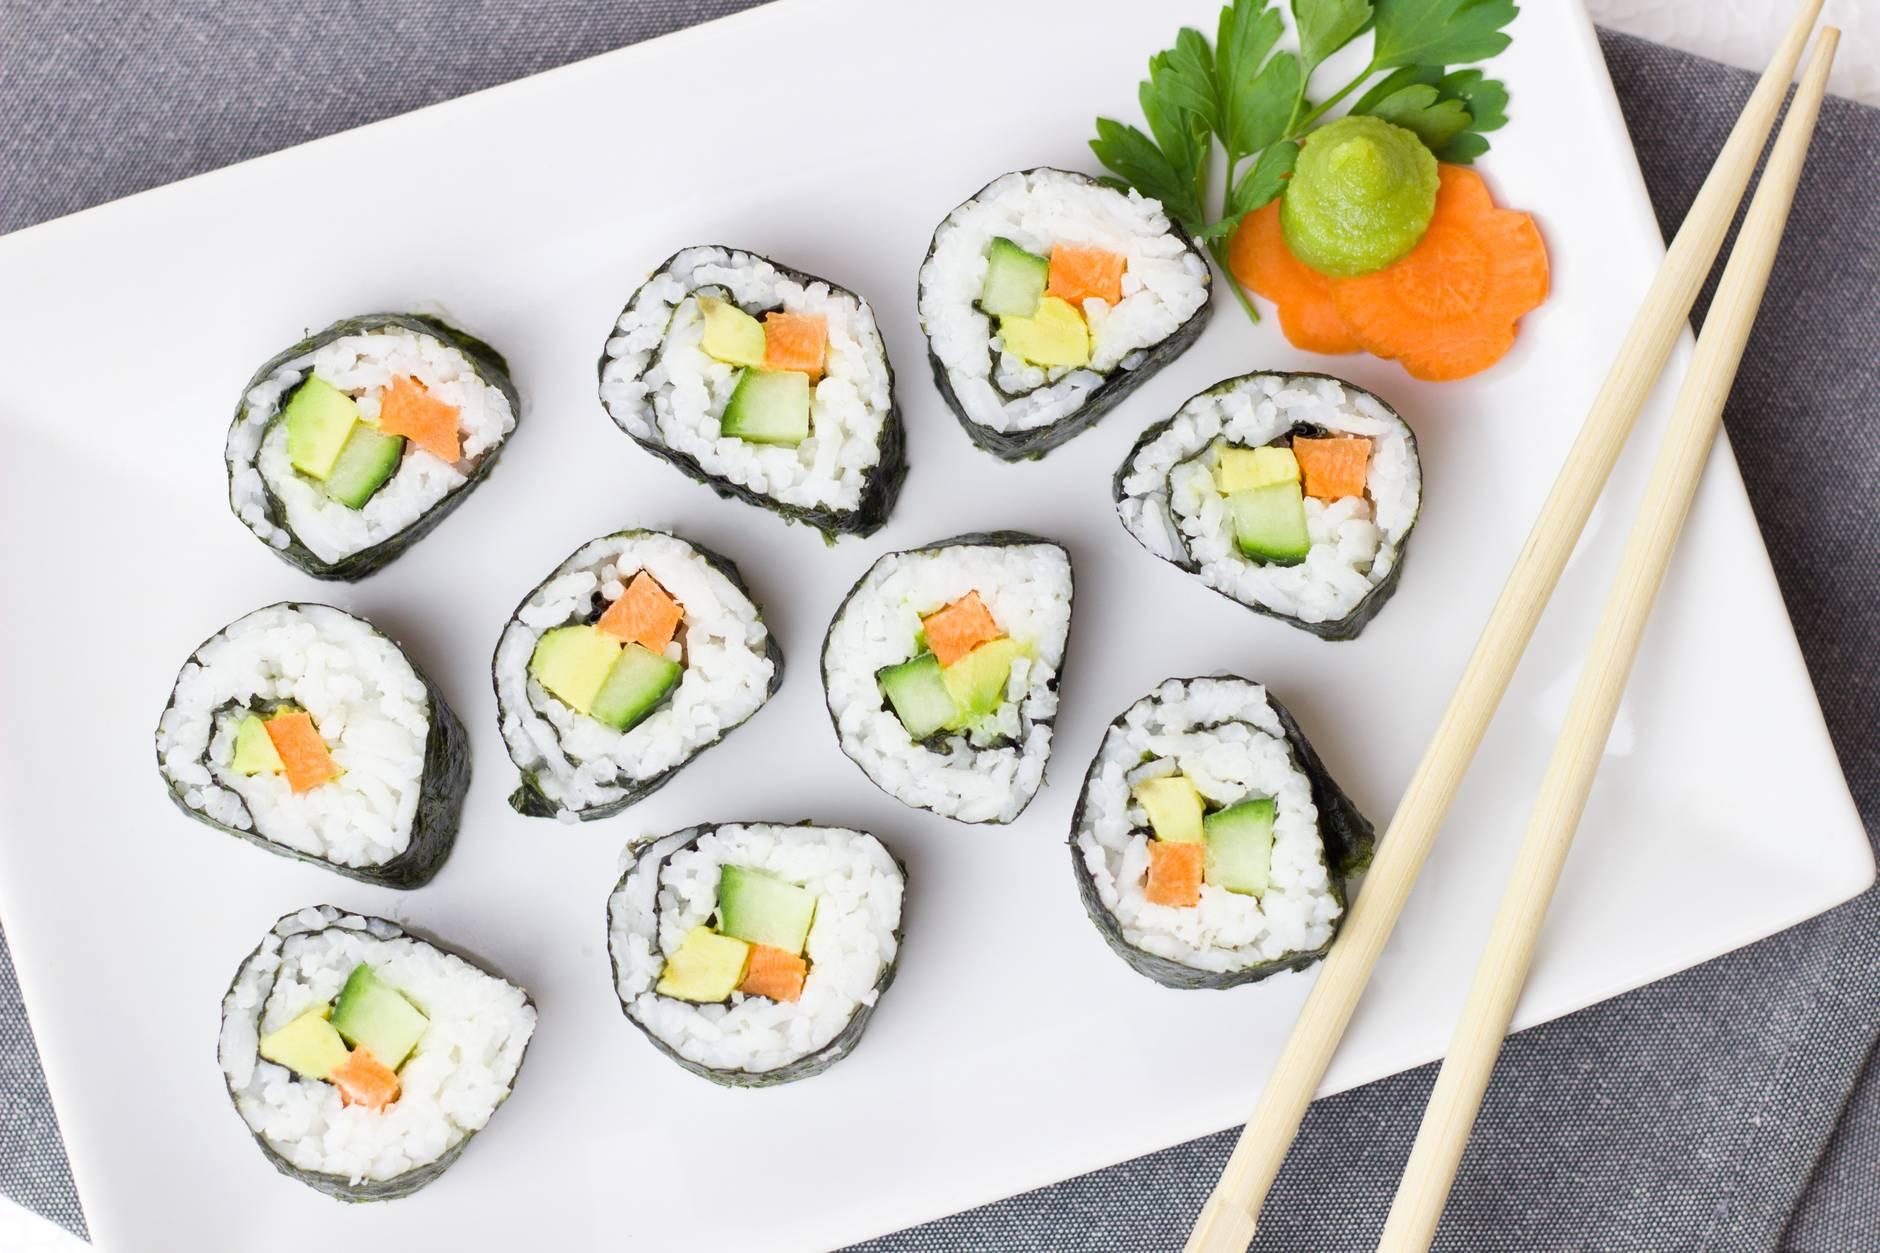 asia carrot chopsticks delicious